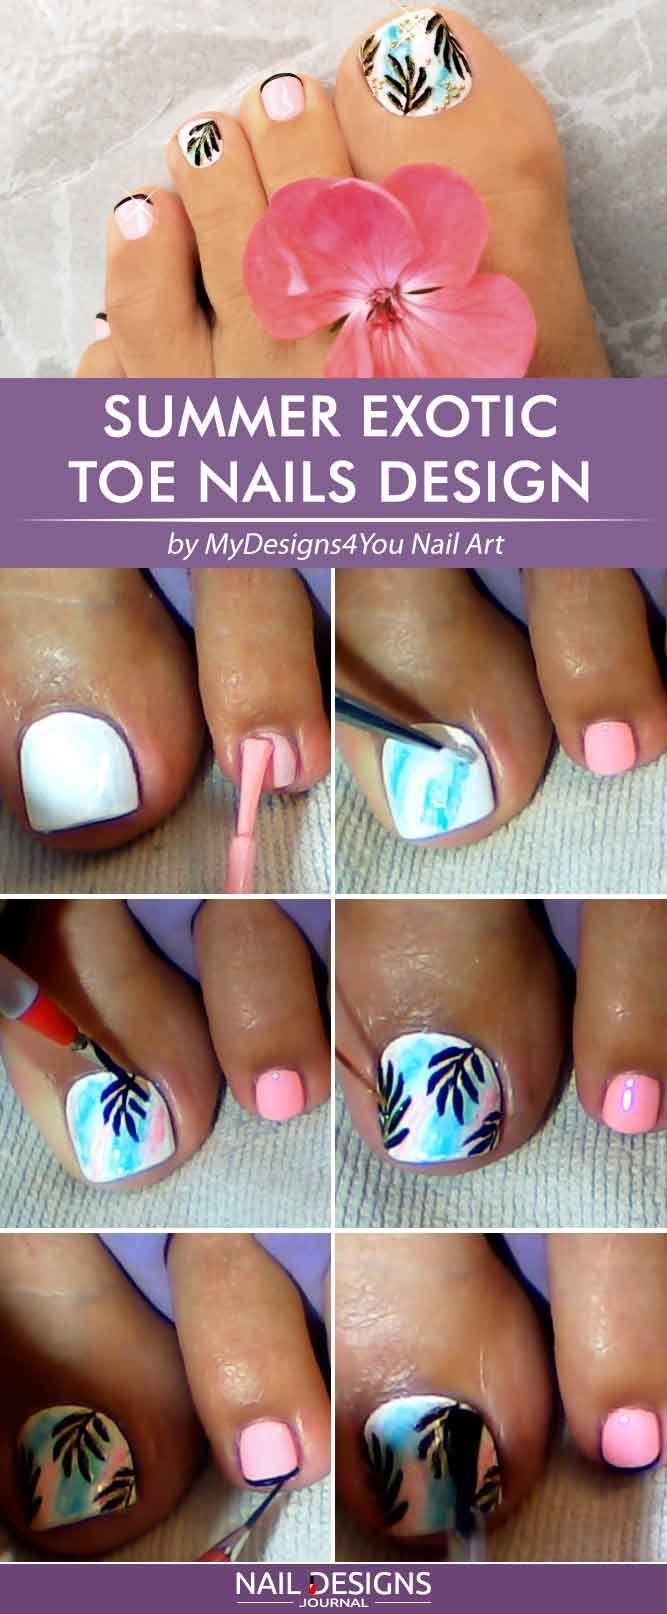 Simple Diy Toe Nail Designs Naildesignsjournal Com Easy Toe Nail Designs Toe Nails Summer Toe Nails